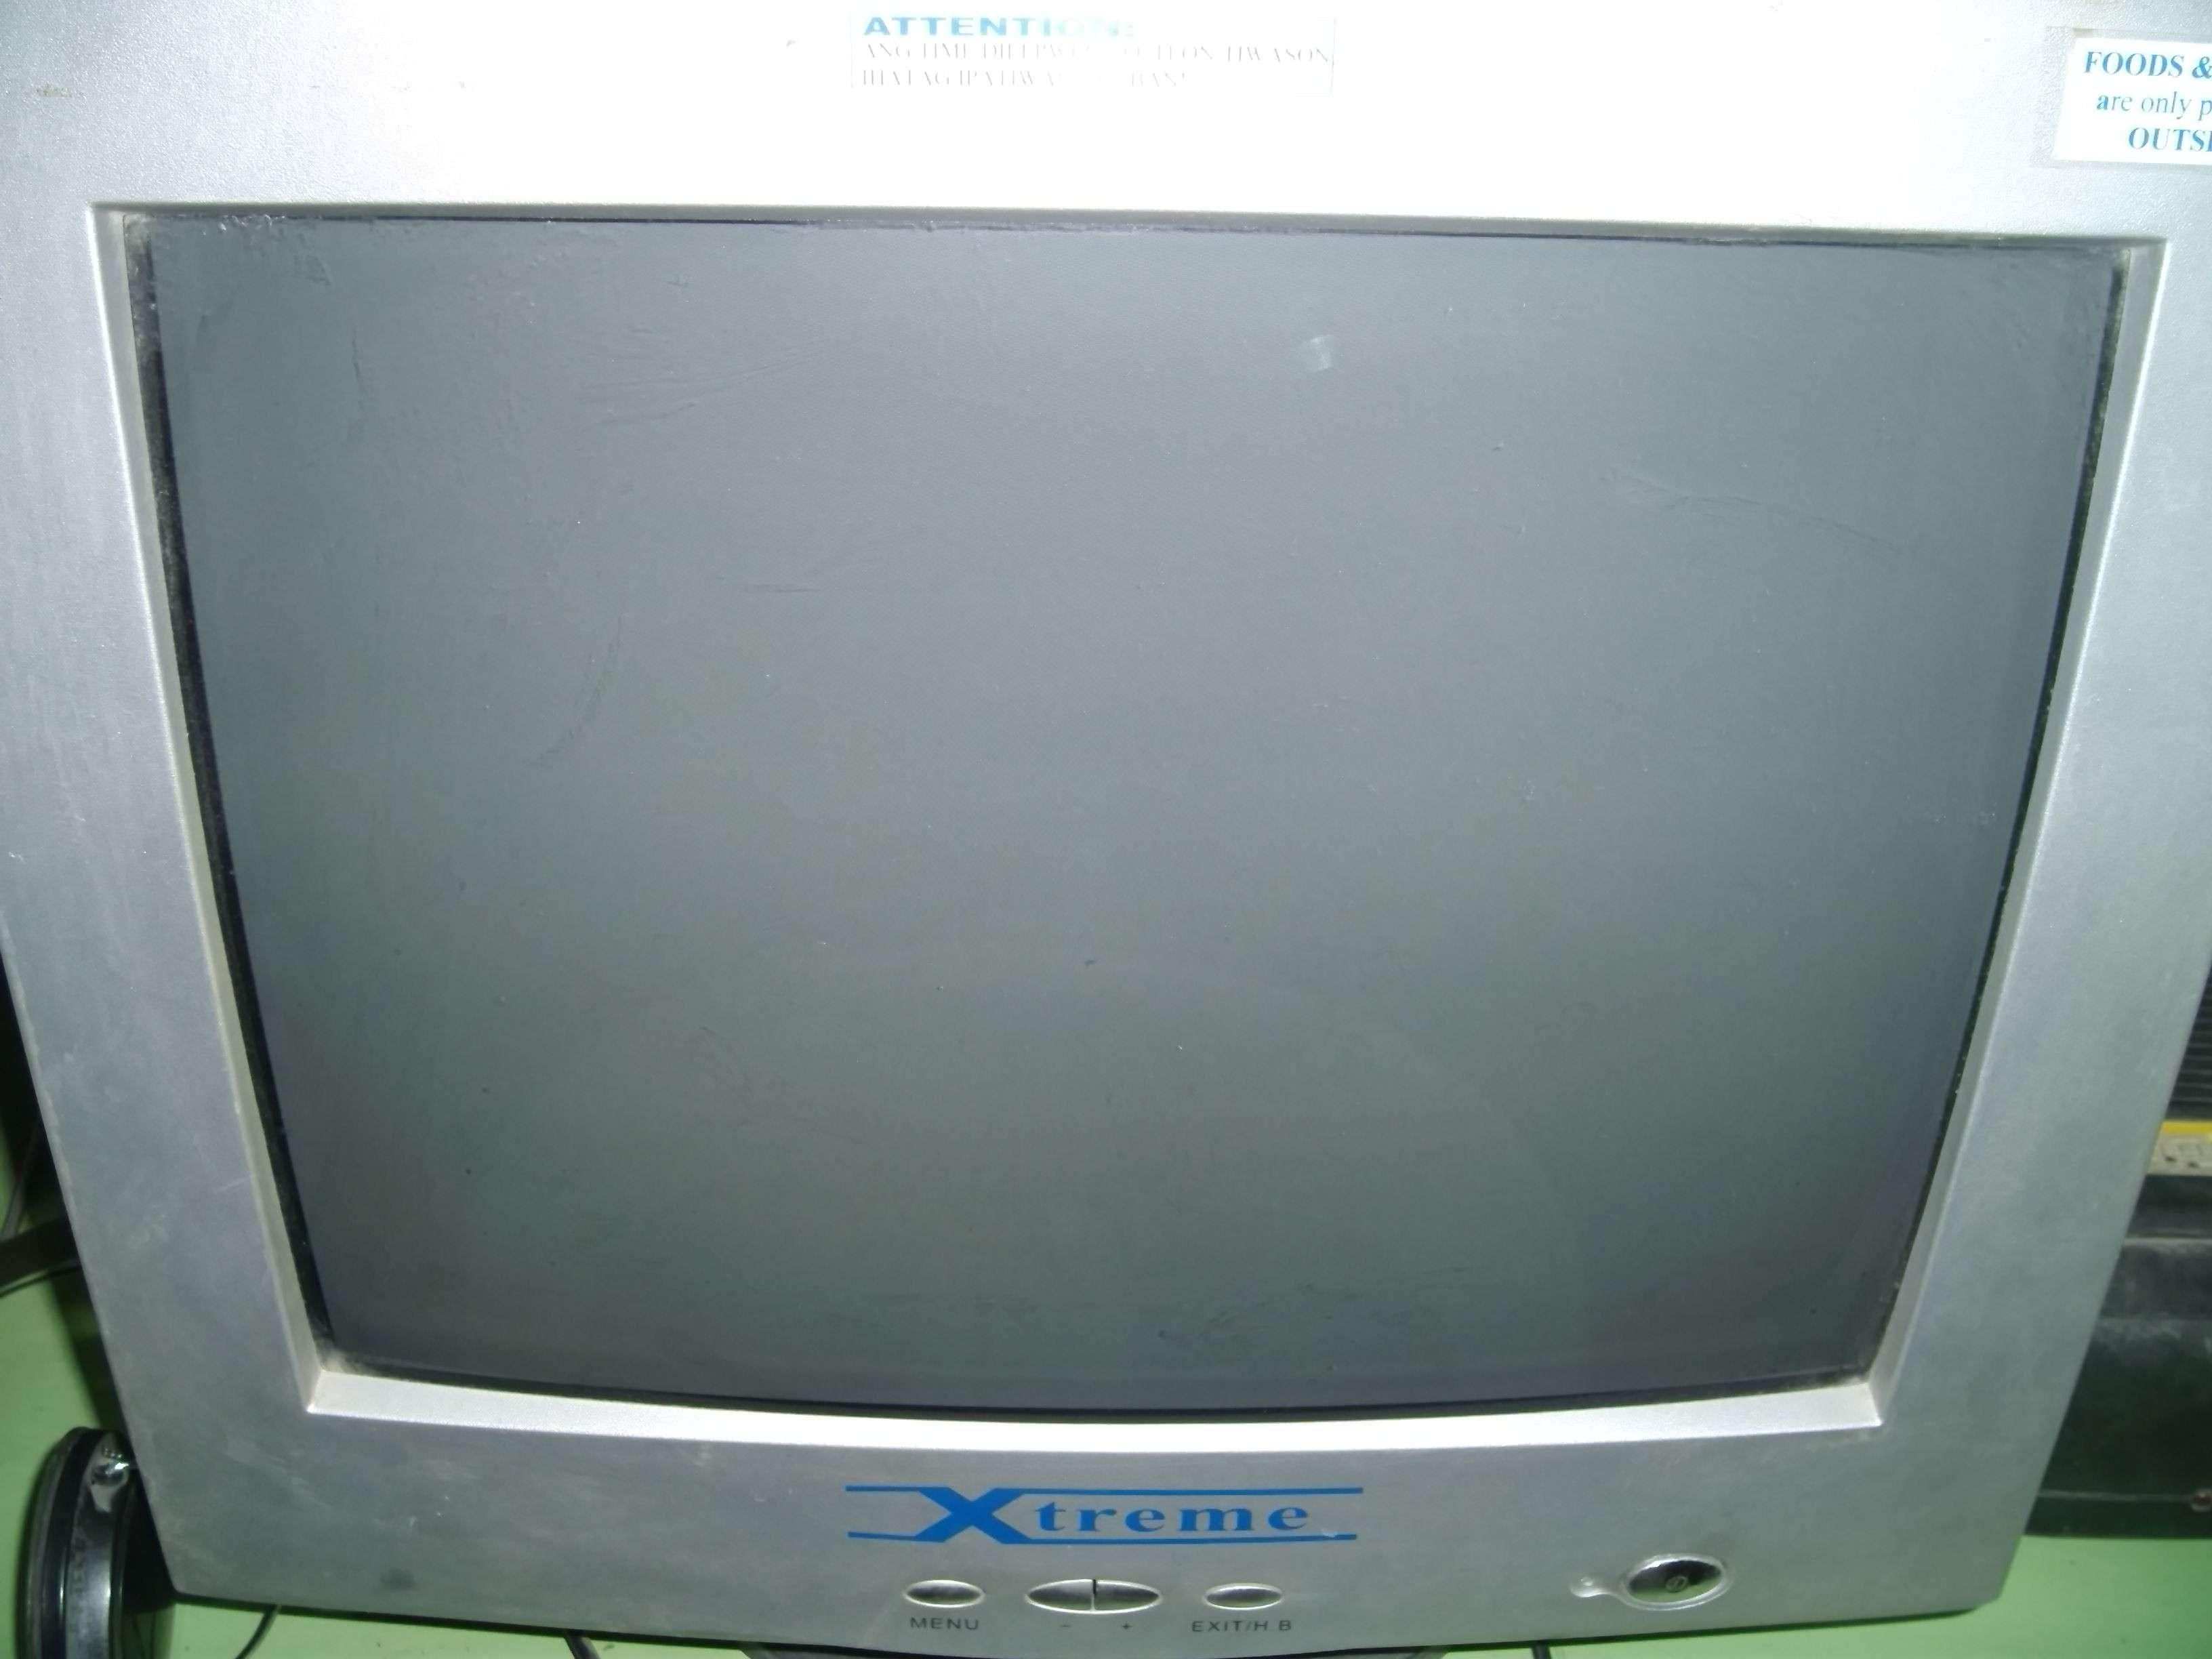 FOR SALE: COMPUTER SET Gedc0111